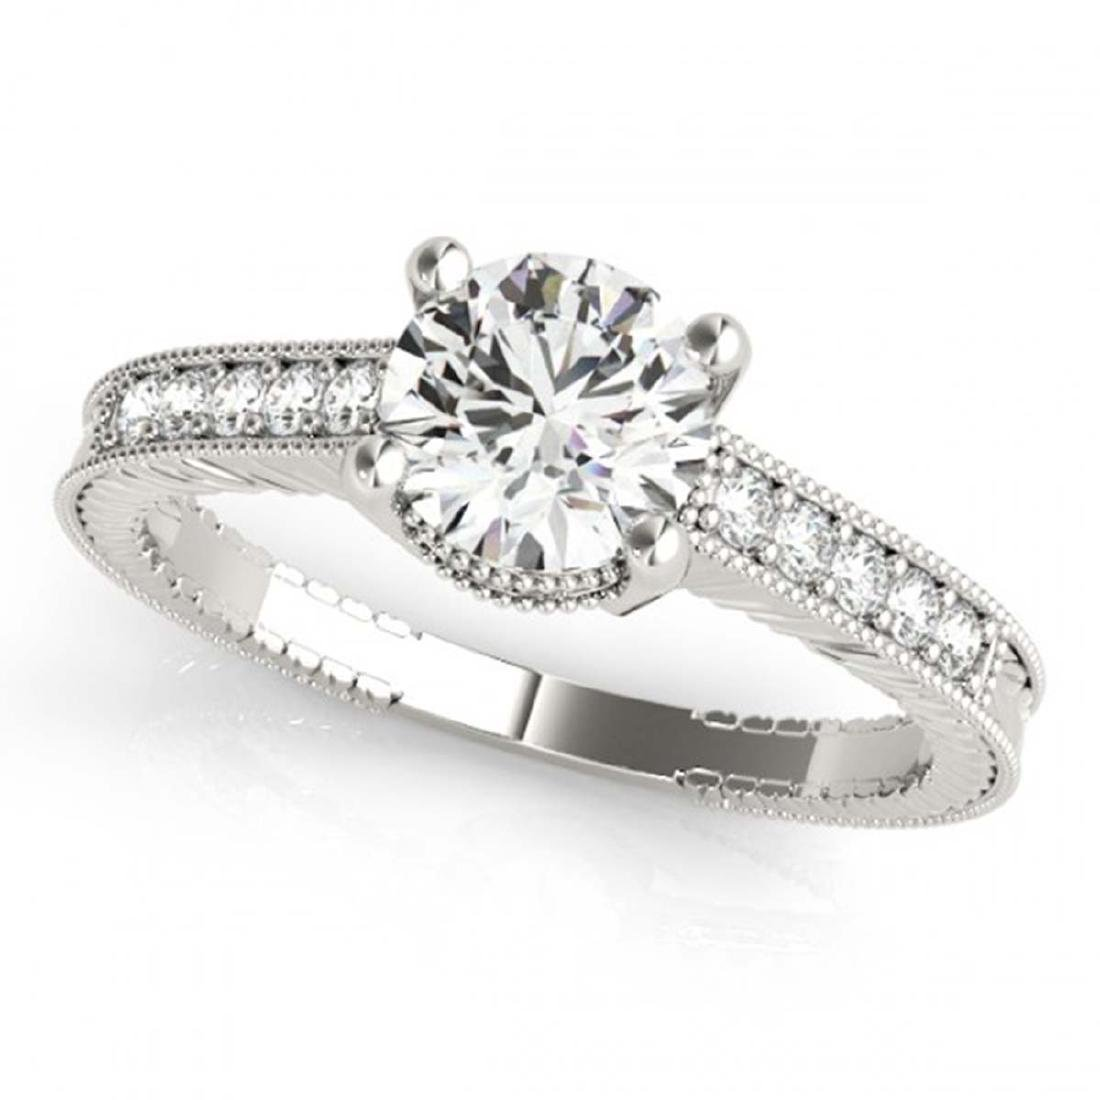 0.70 ctw VS/SI Diamond Ring 18K White Gold - REF-98M9F